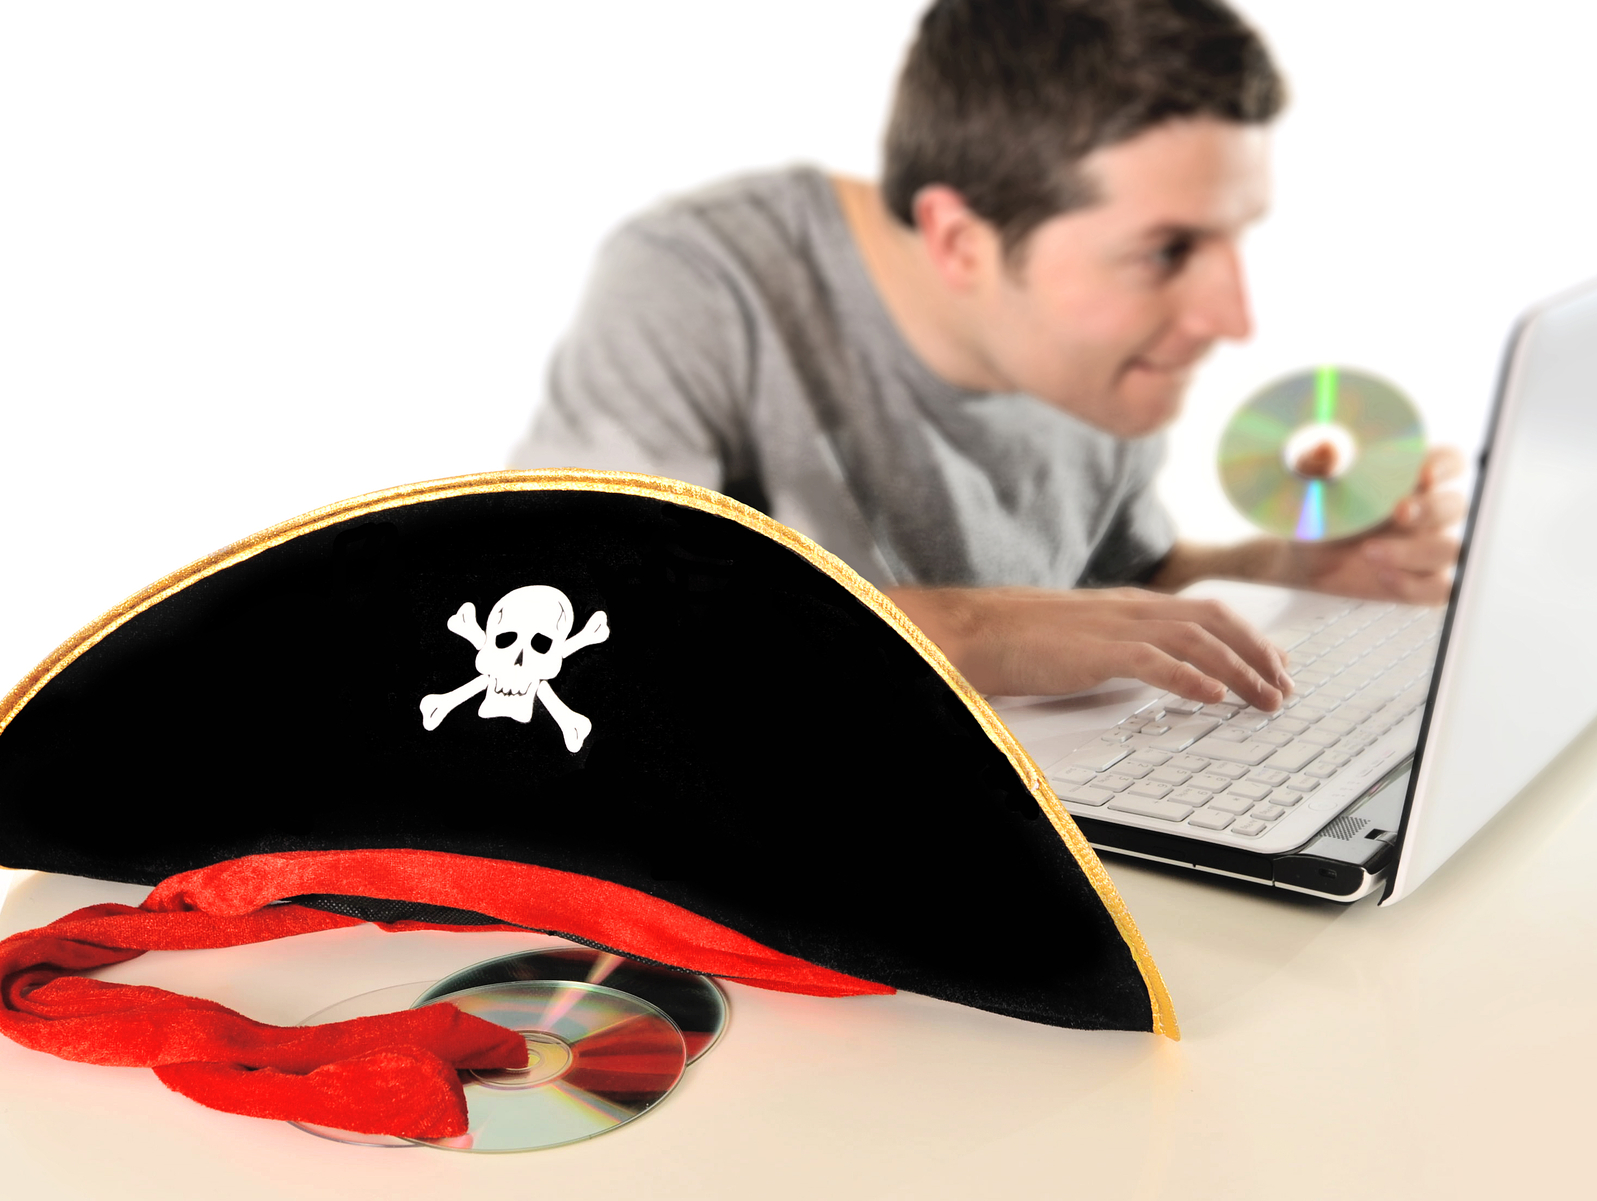 Online pirate